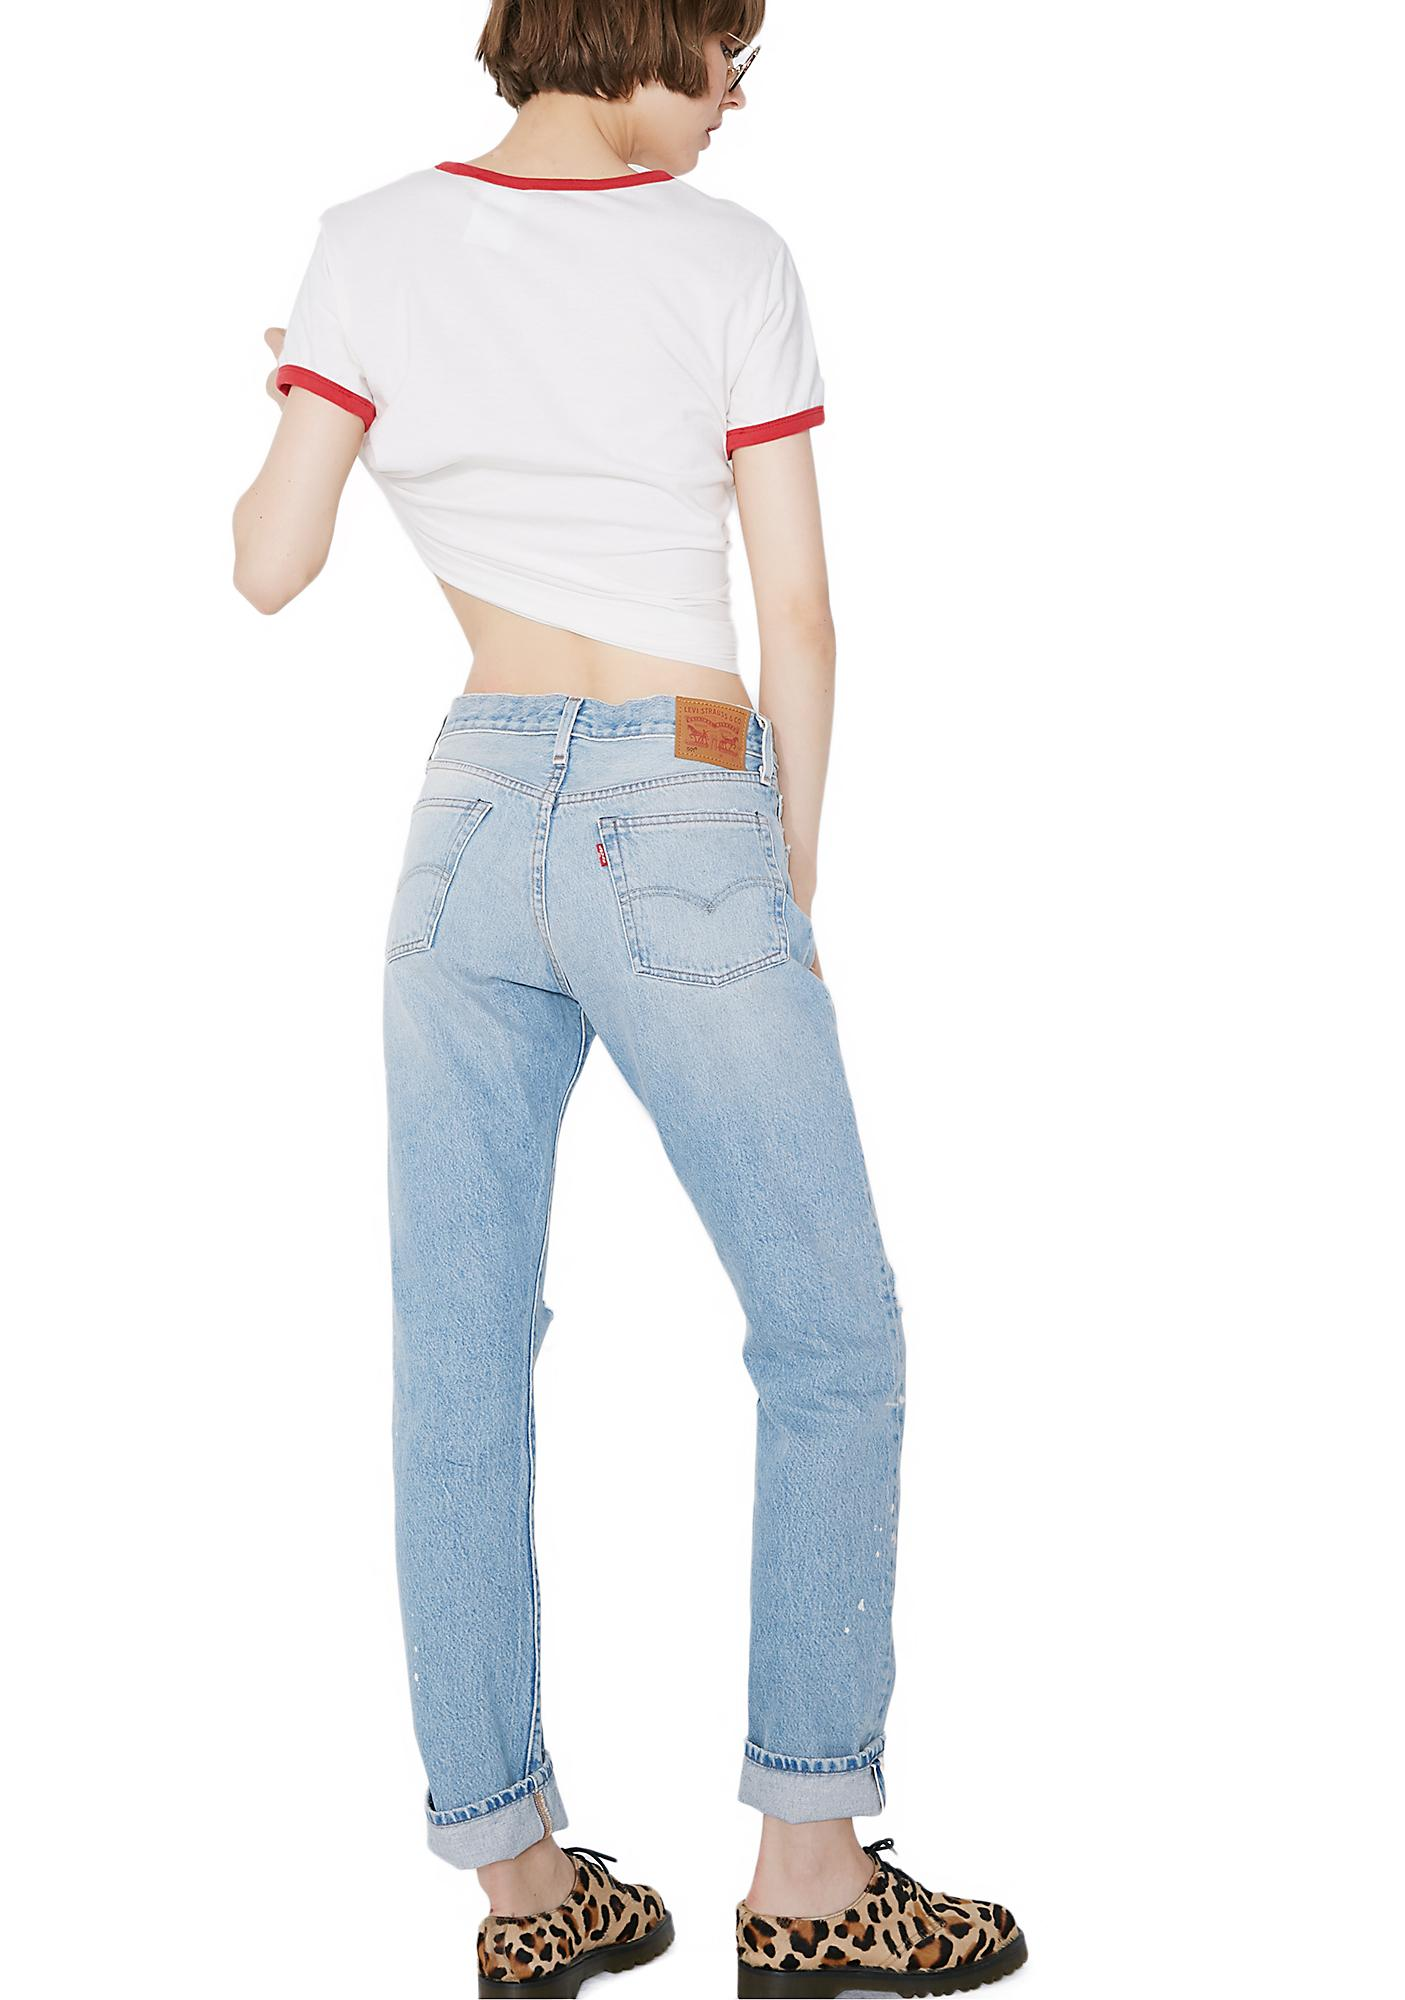 Levis 501 Jeans For Women